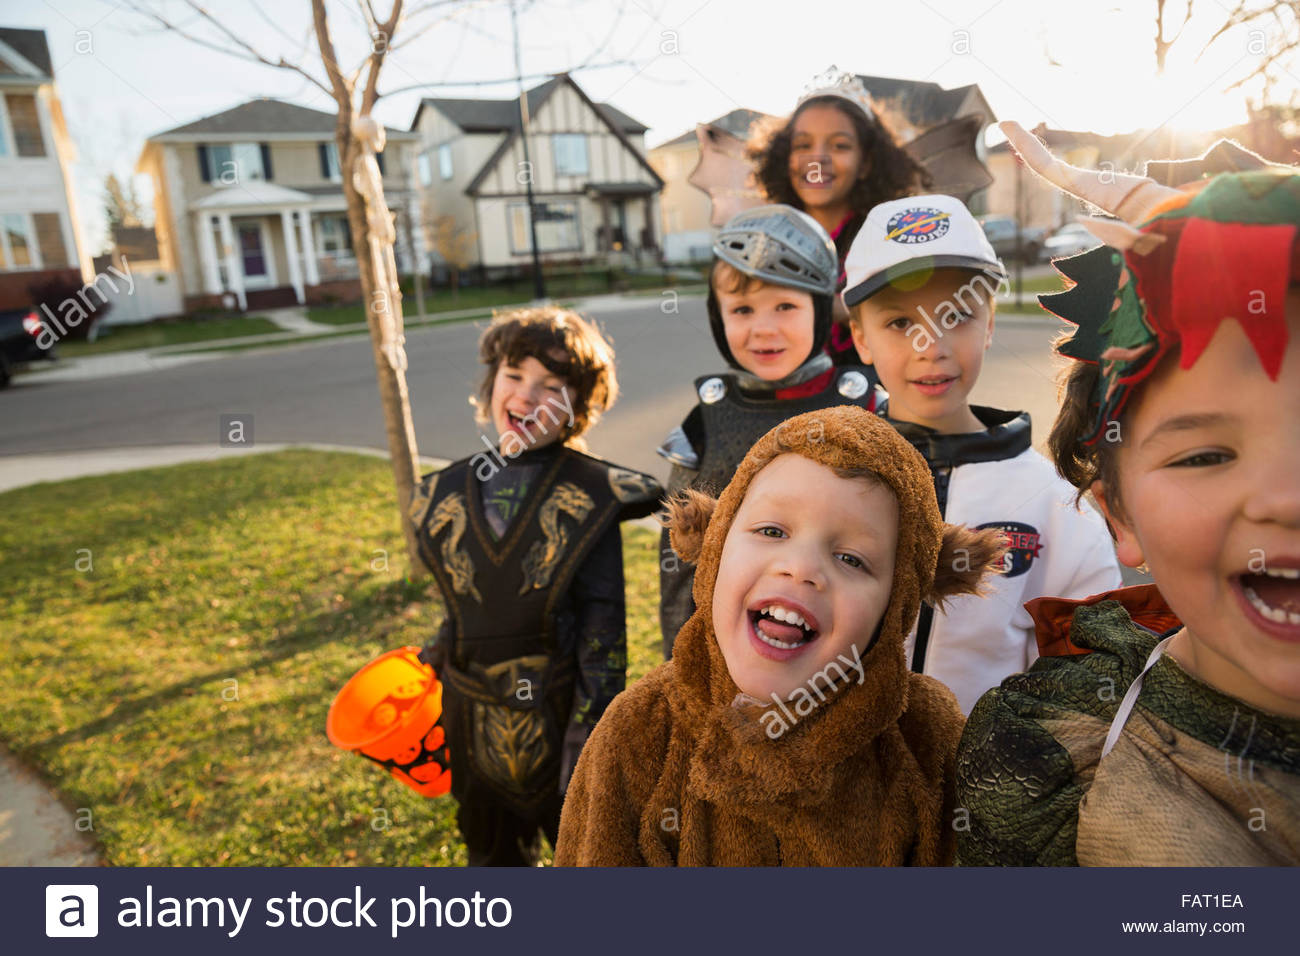 Portrait enthusiastic kids in Halloween costumes - Stock Image